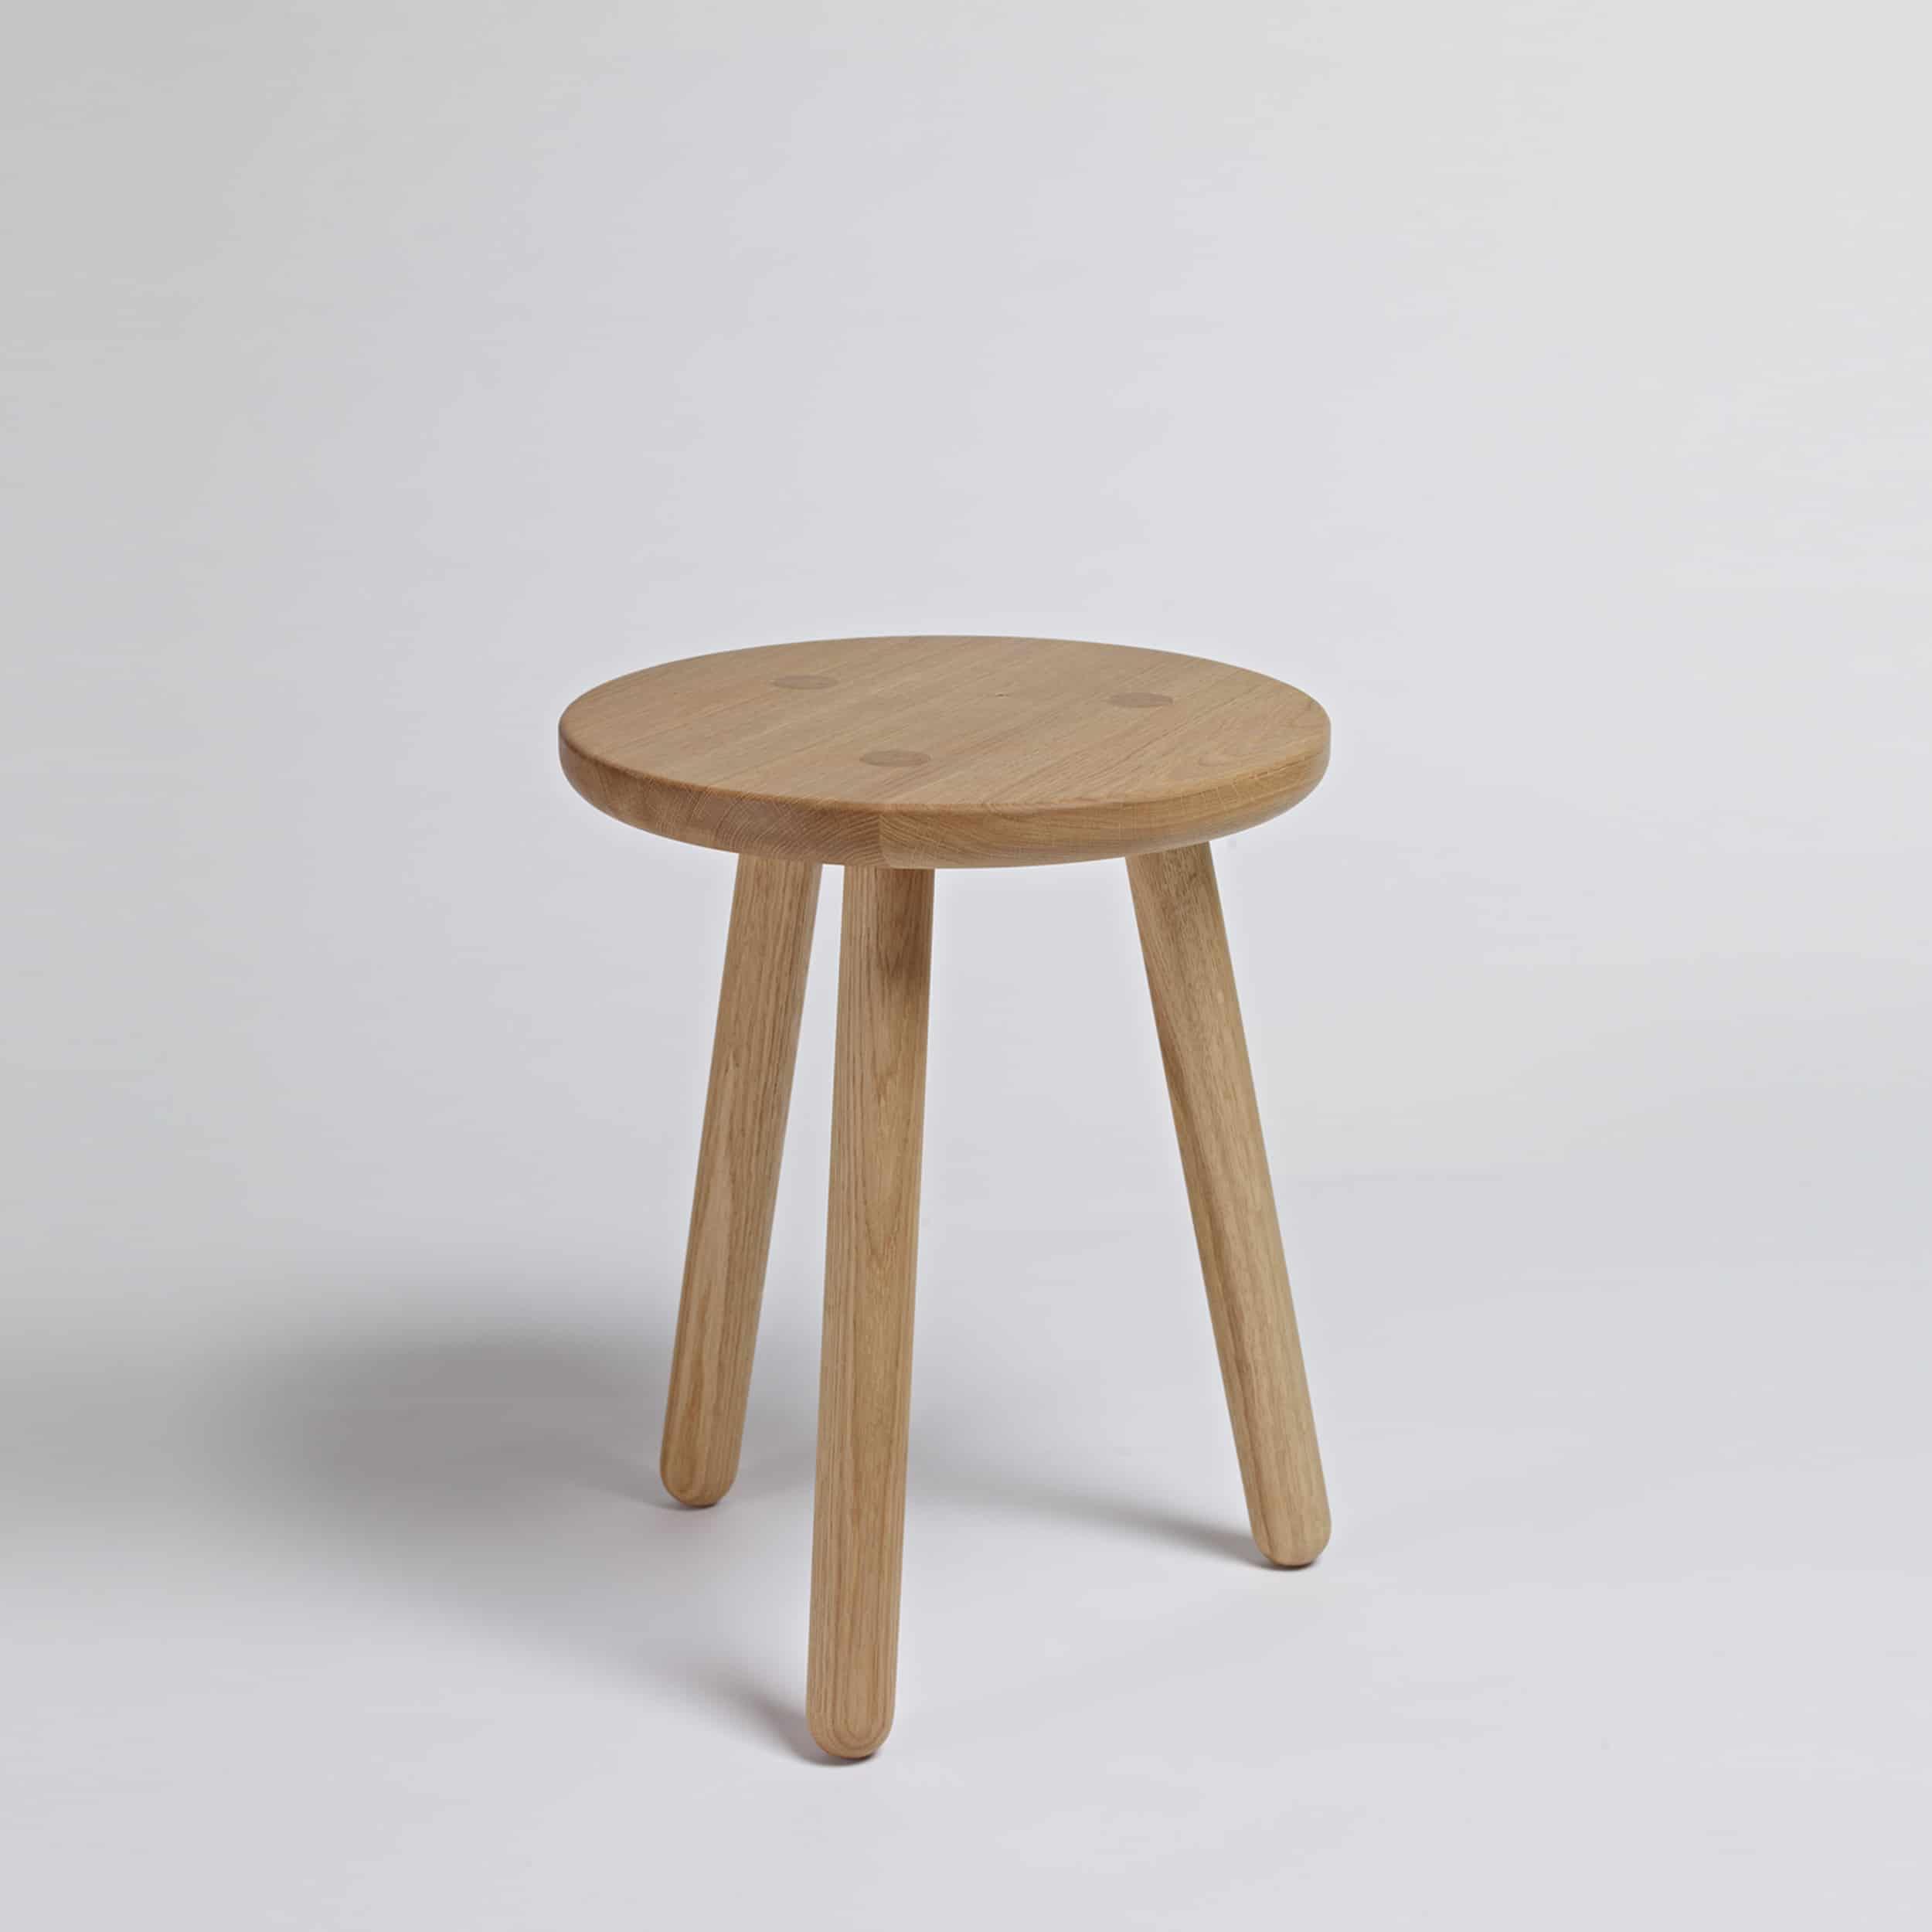 Wondrous Side Table One Ncnpc Chair Design For Home Ncnpcorg